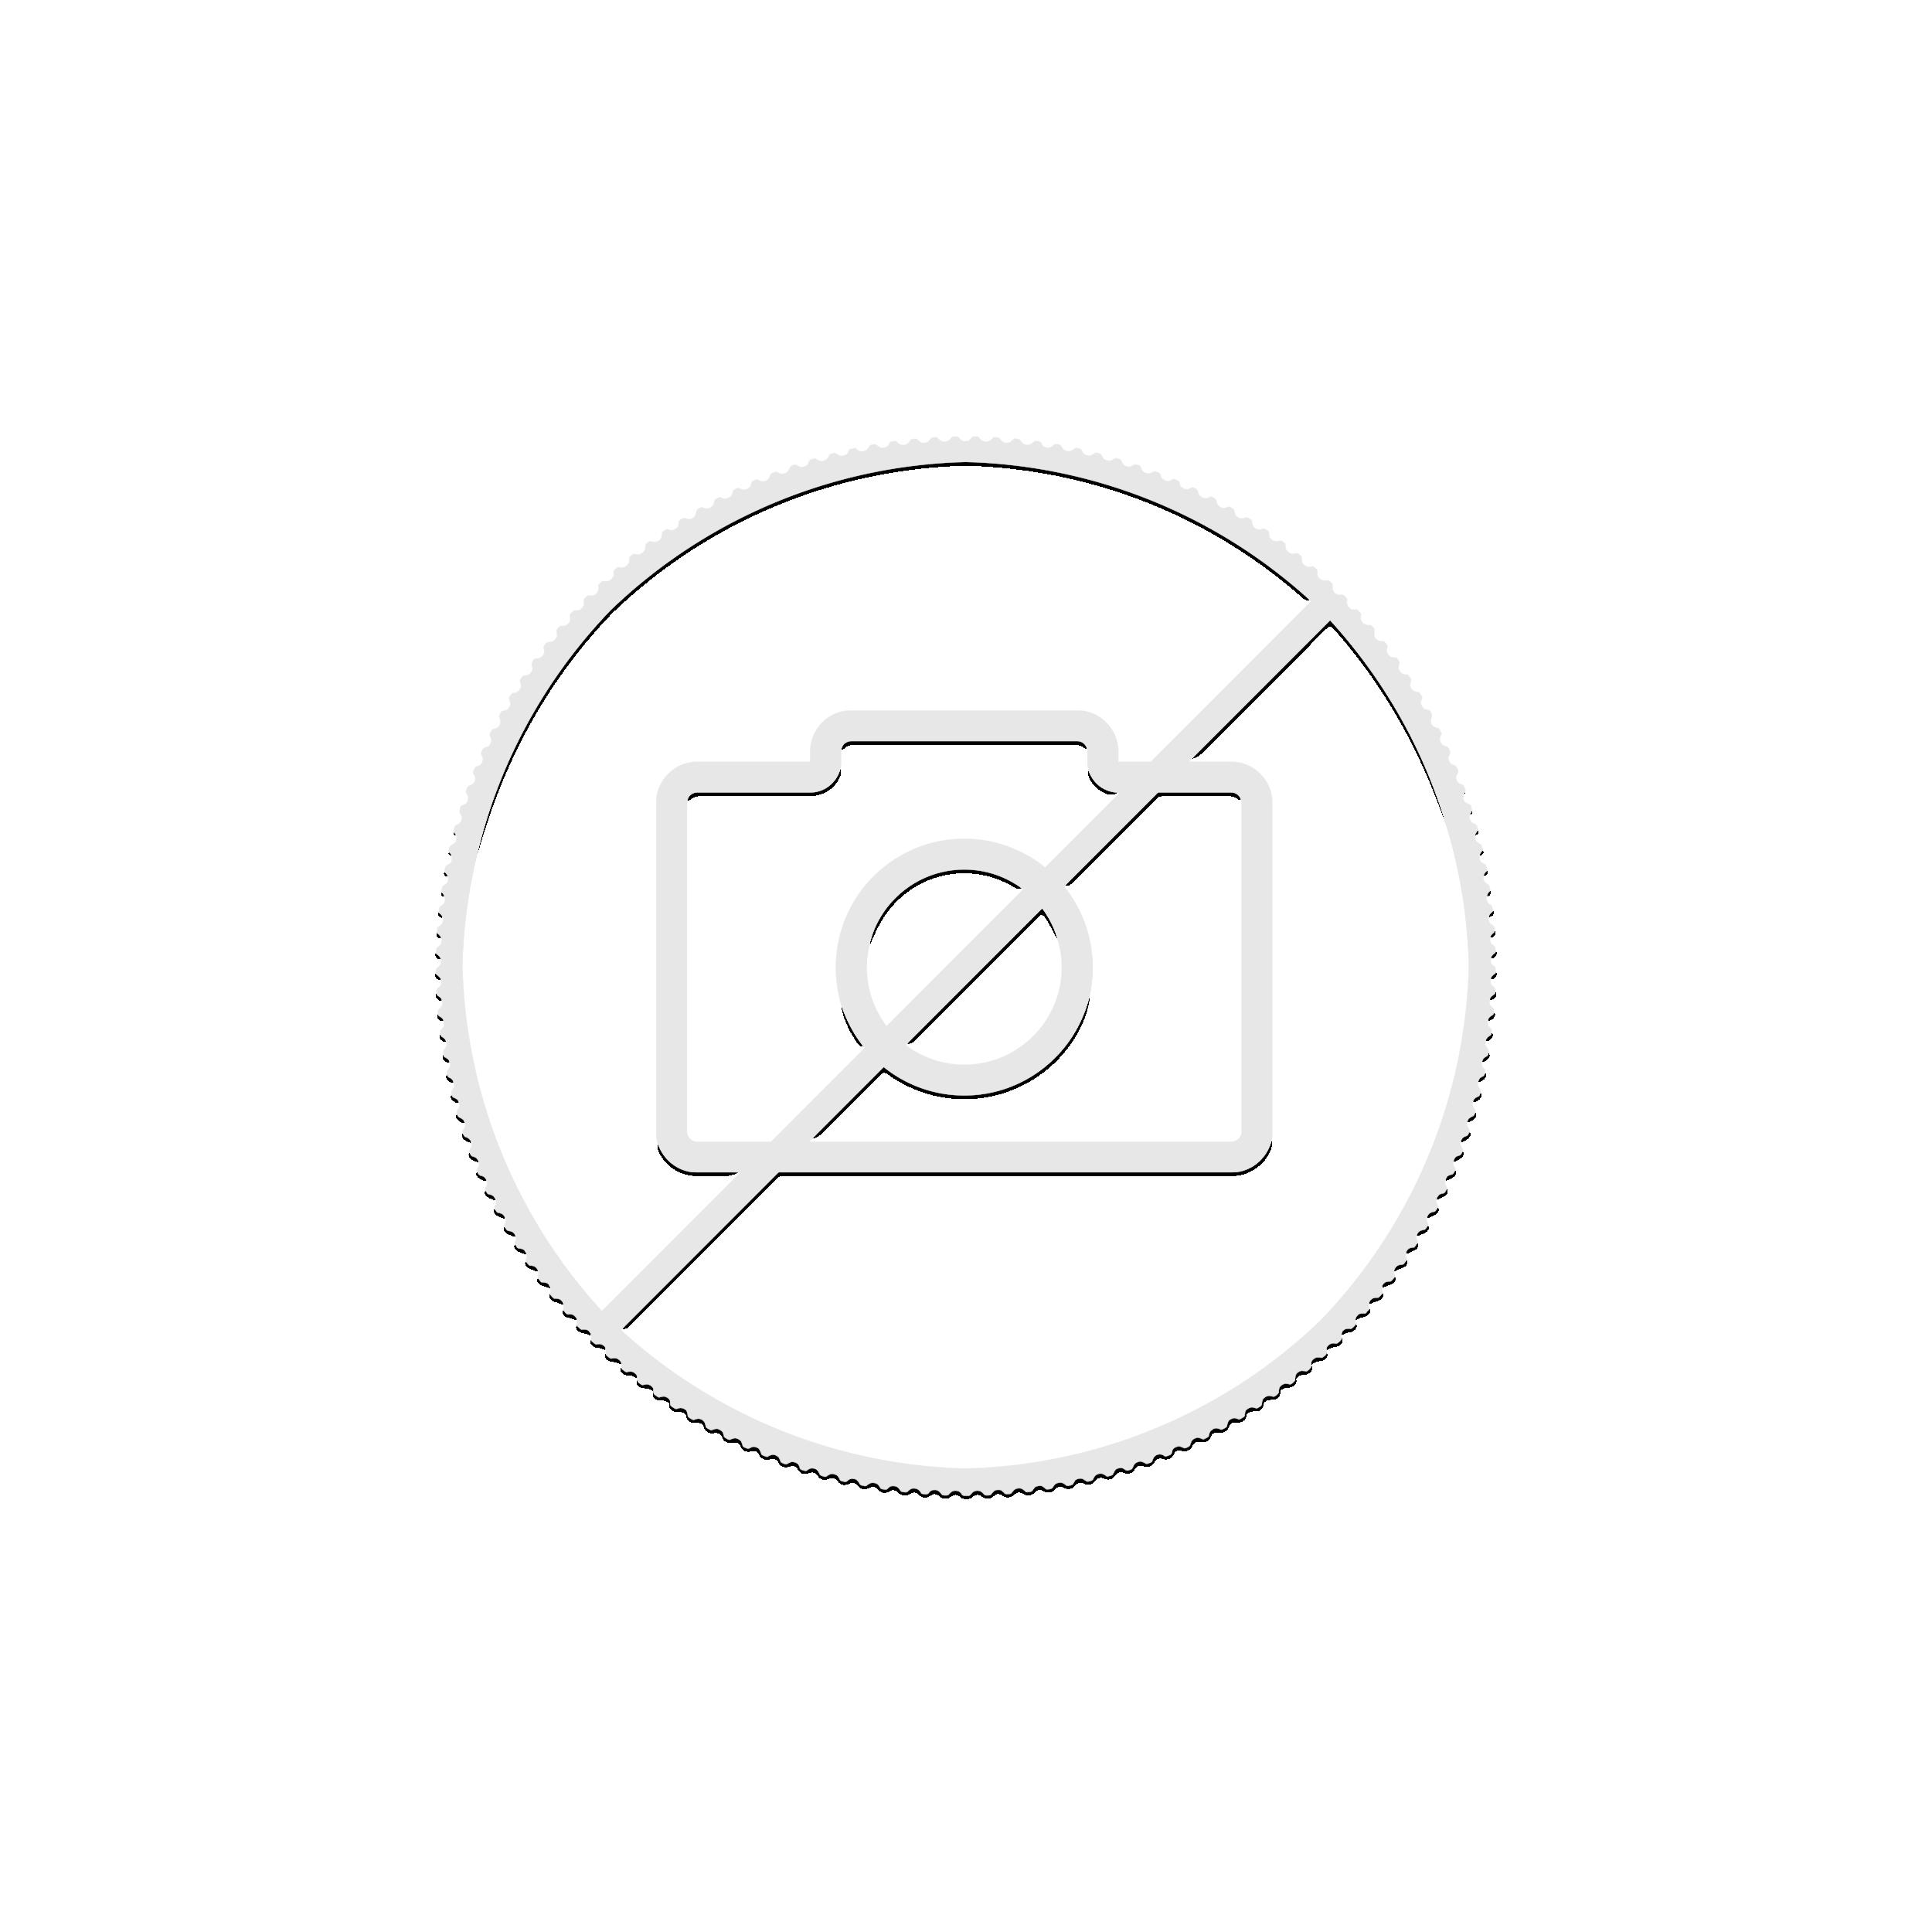 1 troy ounce Silver Eagle 2020 - Noorderlicht